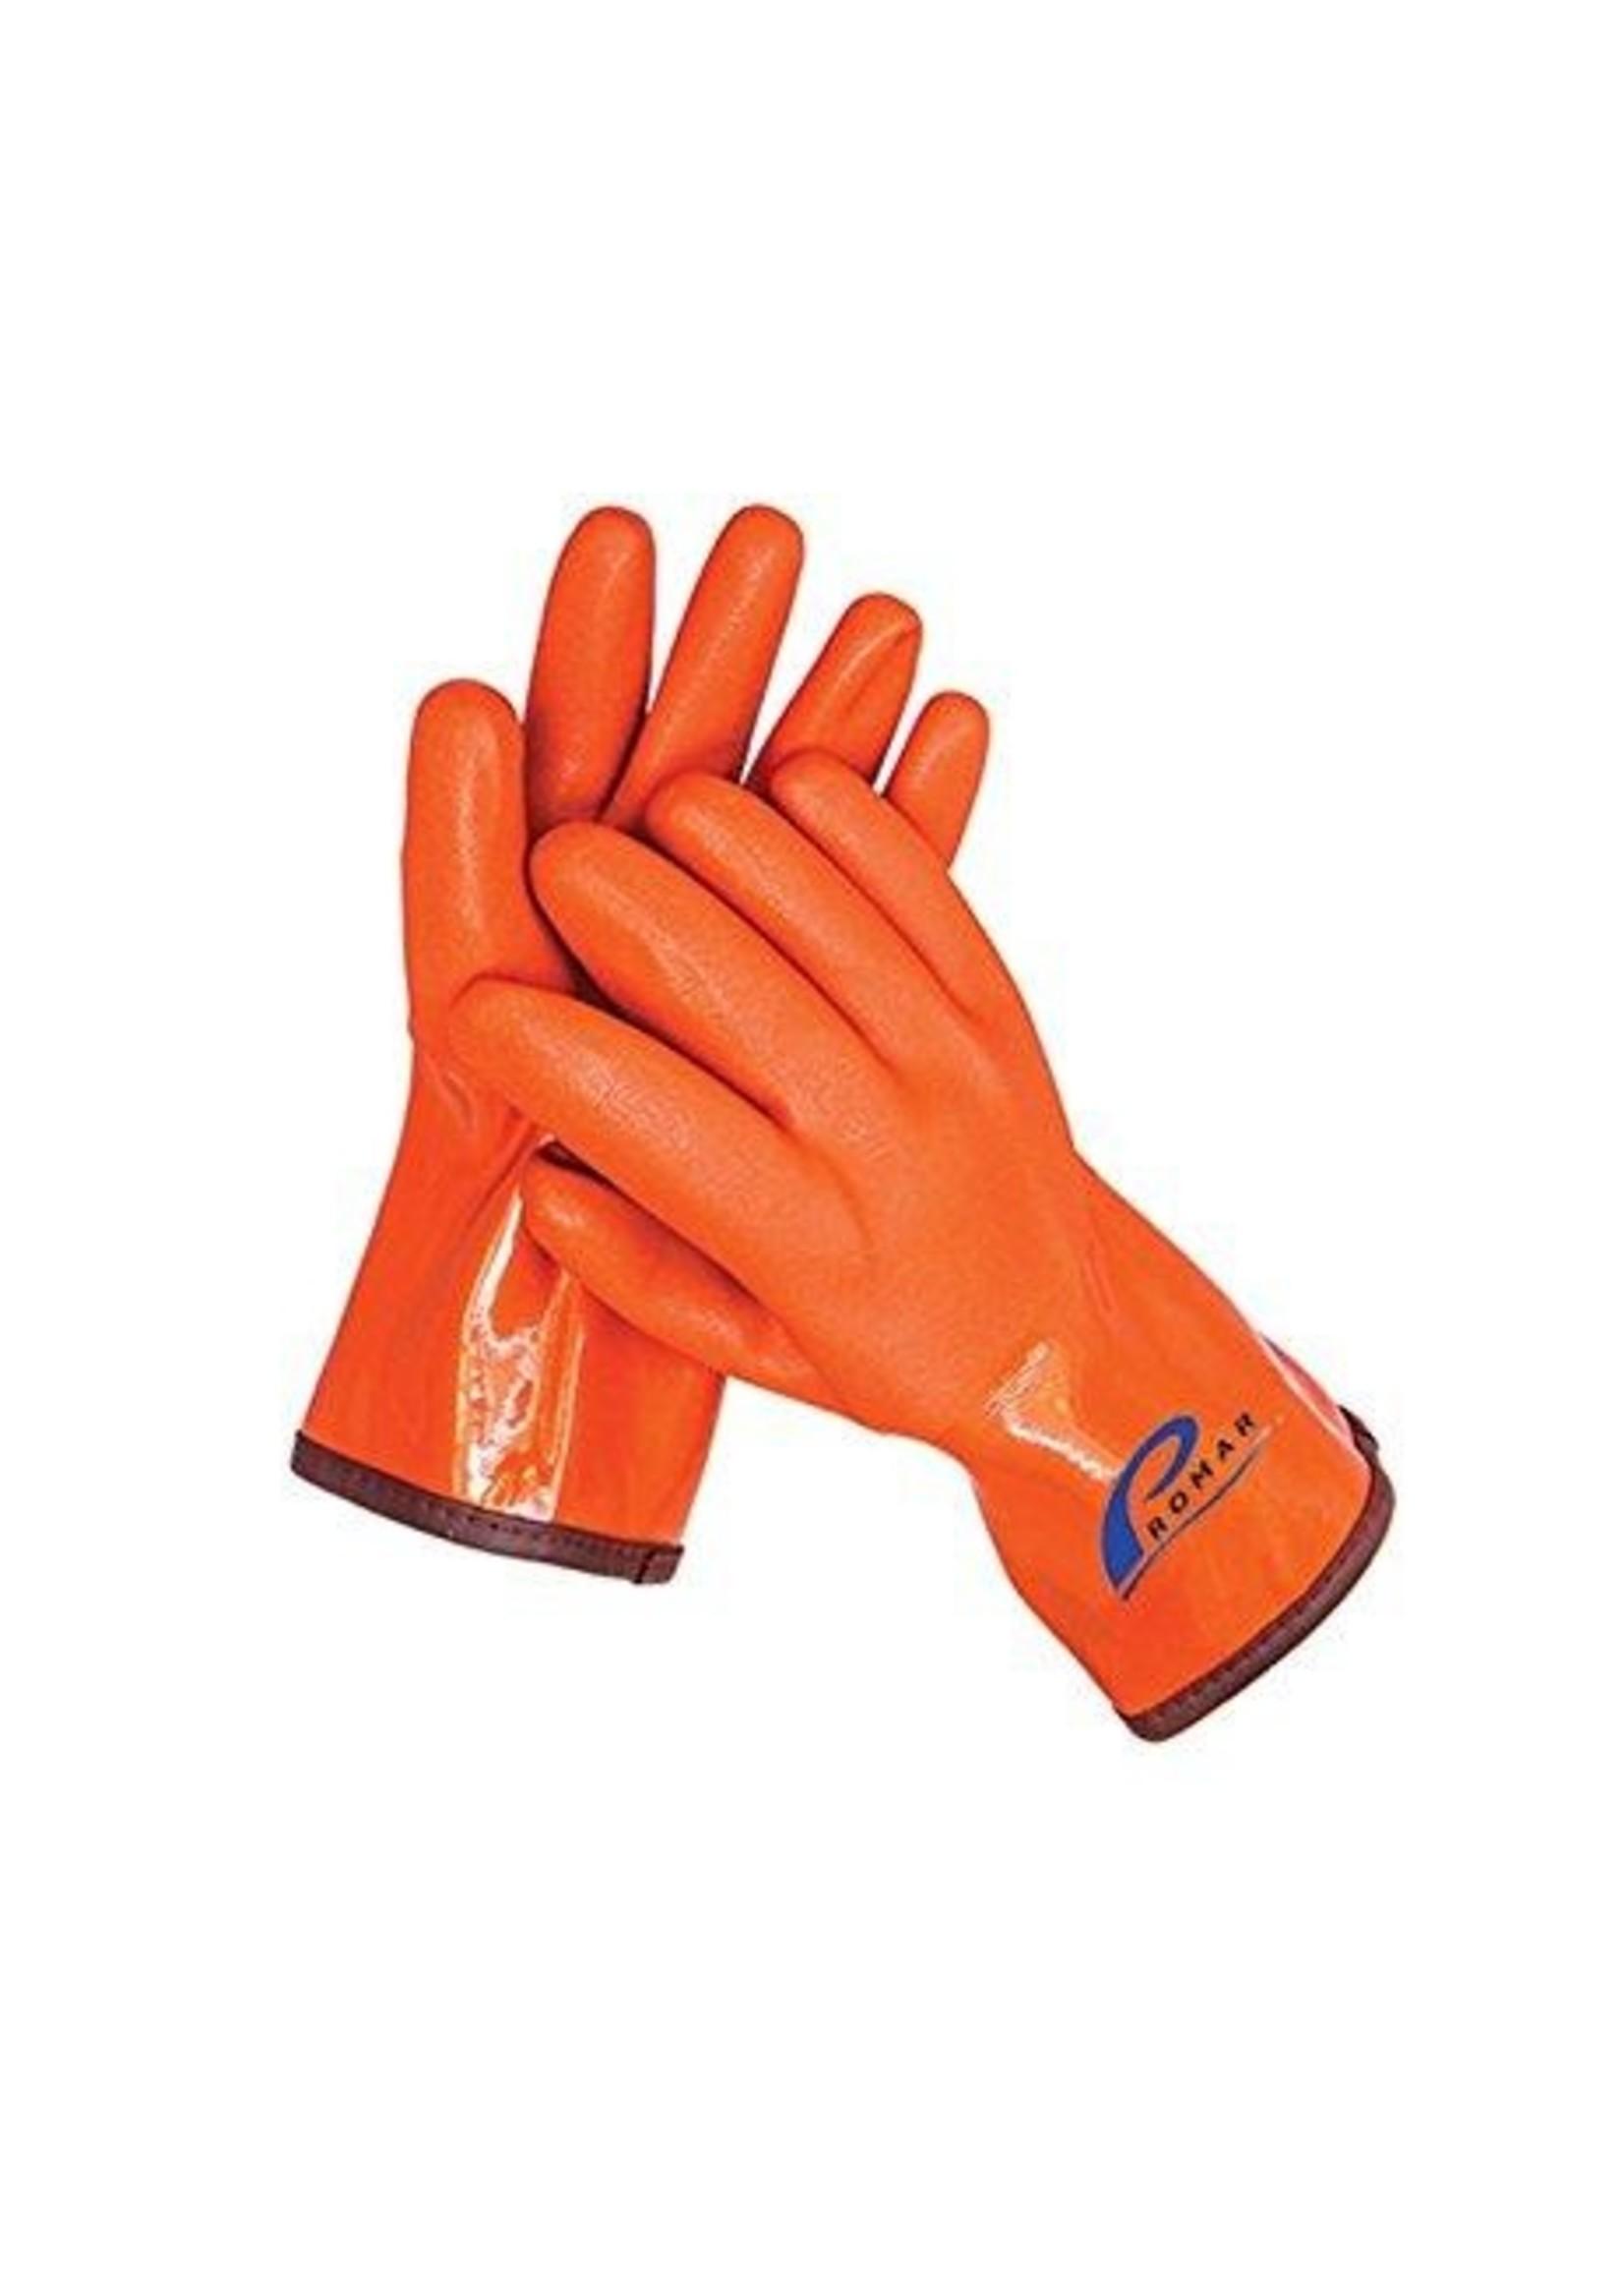 Promar Insulated ProGrip Gloves - Orange X-Large